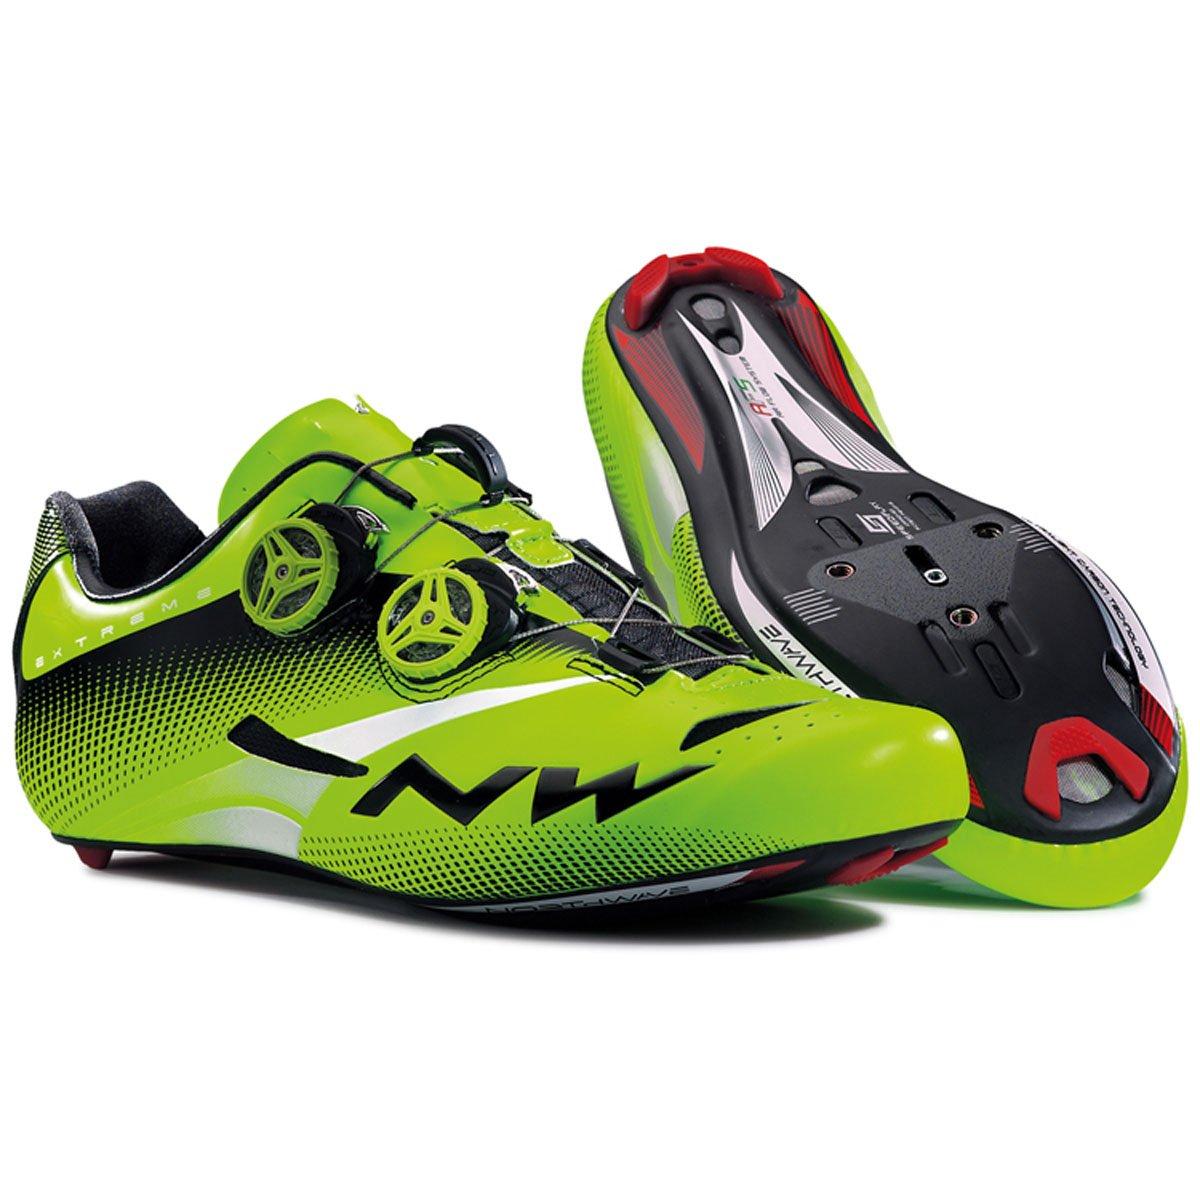 Northwave Extreme Tech Plus 2015 verde zapatos de bicicleta de carretera